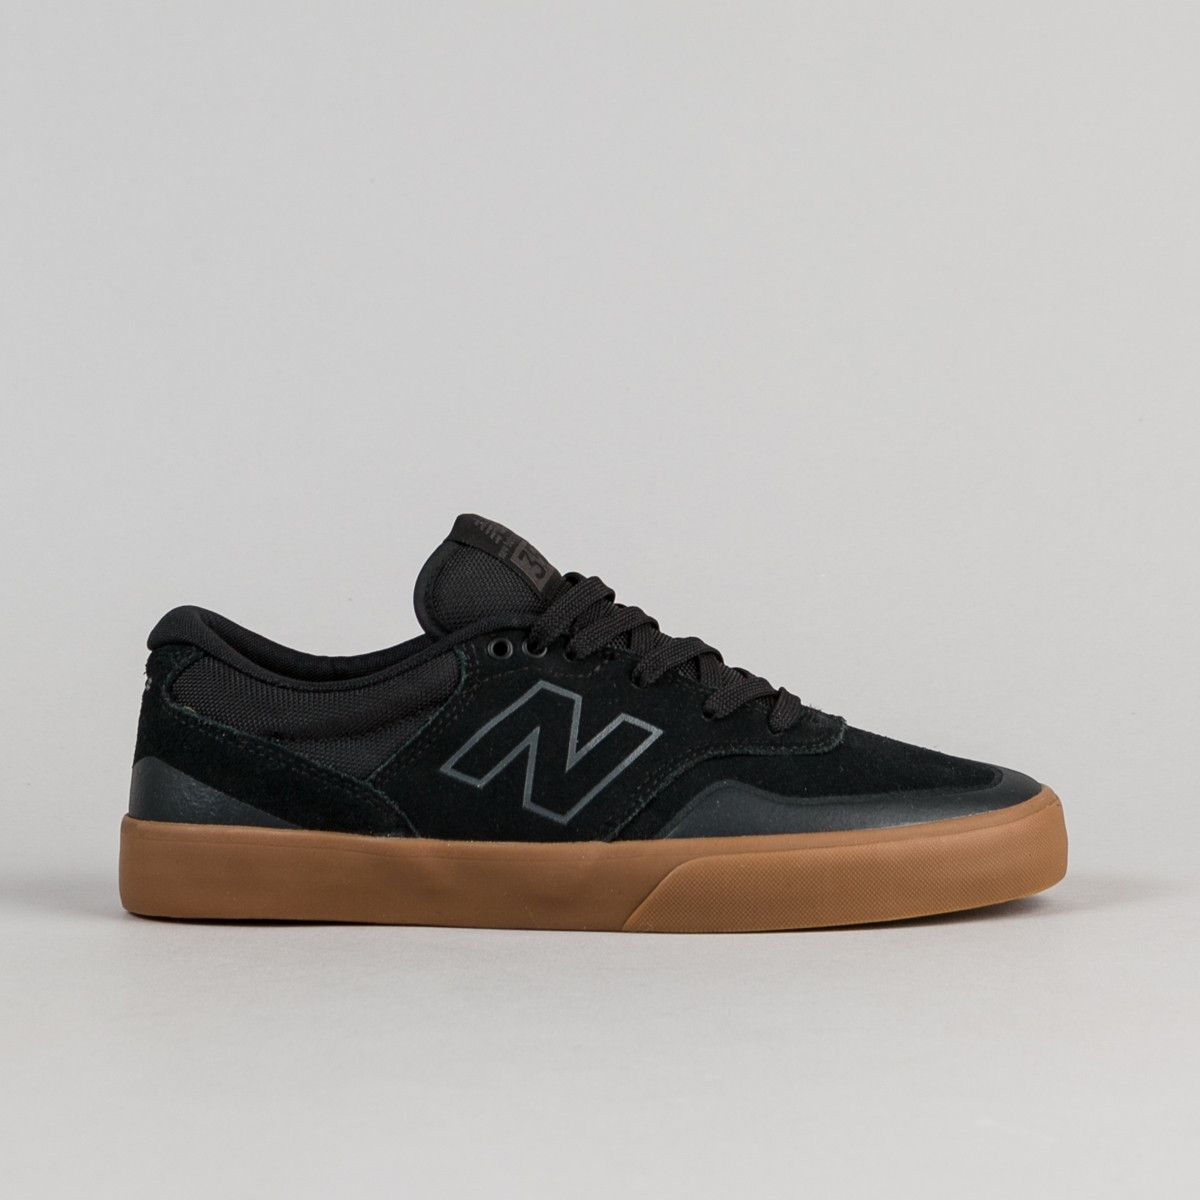 new balance black gum sole